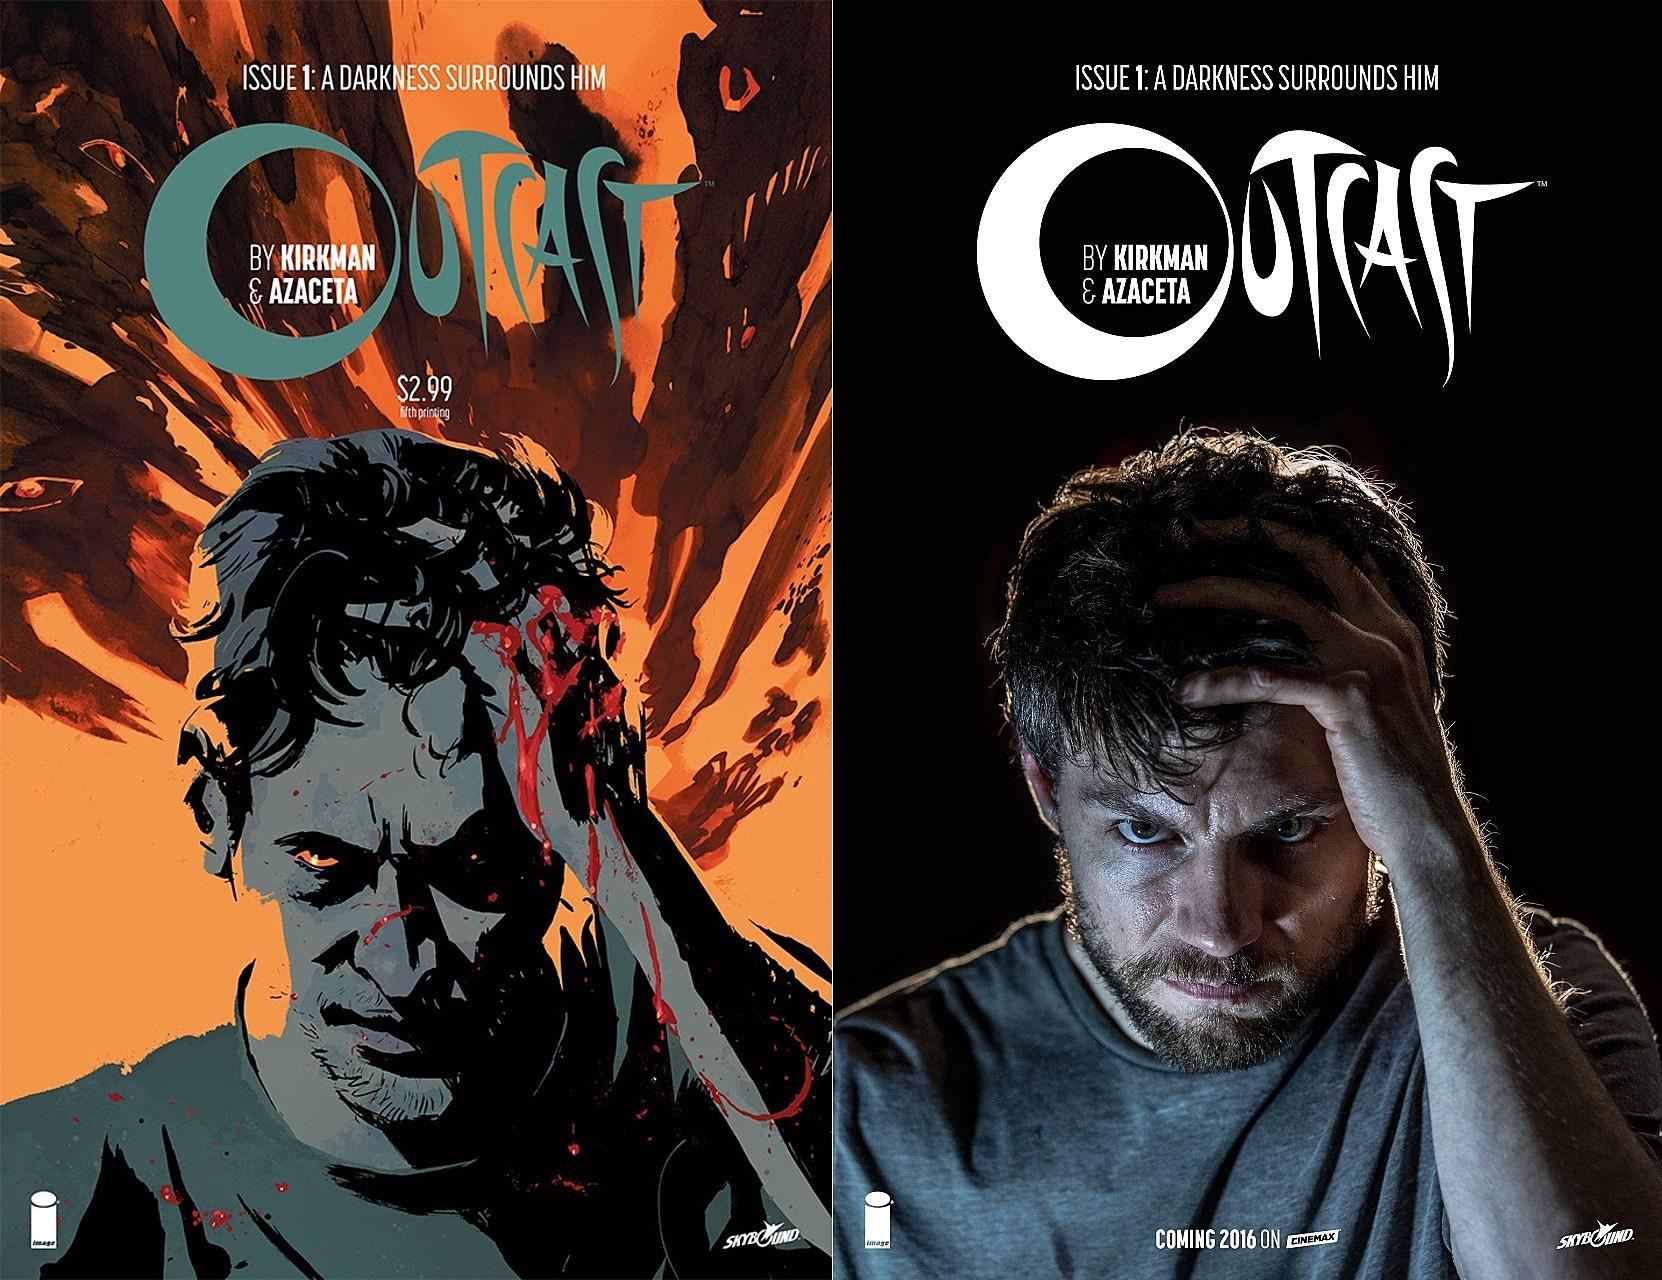 Comic Book News - Magazine cover